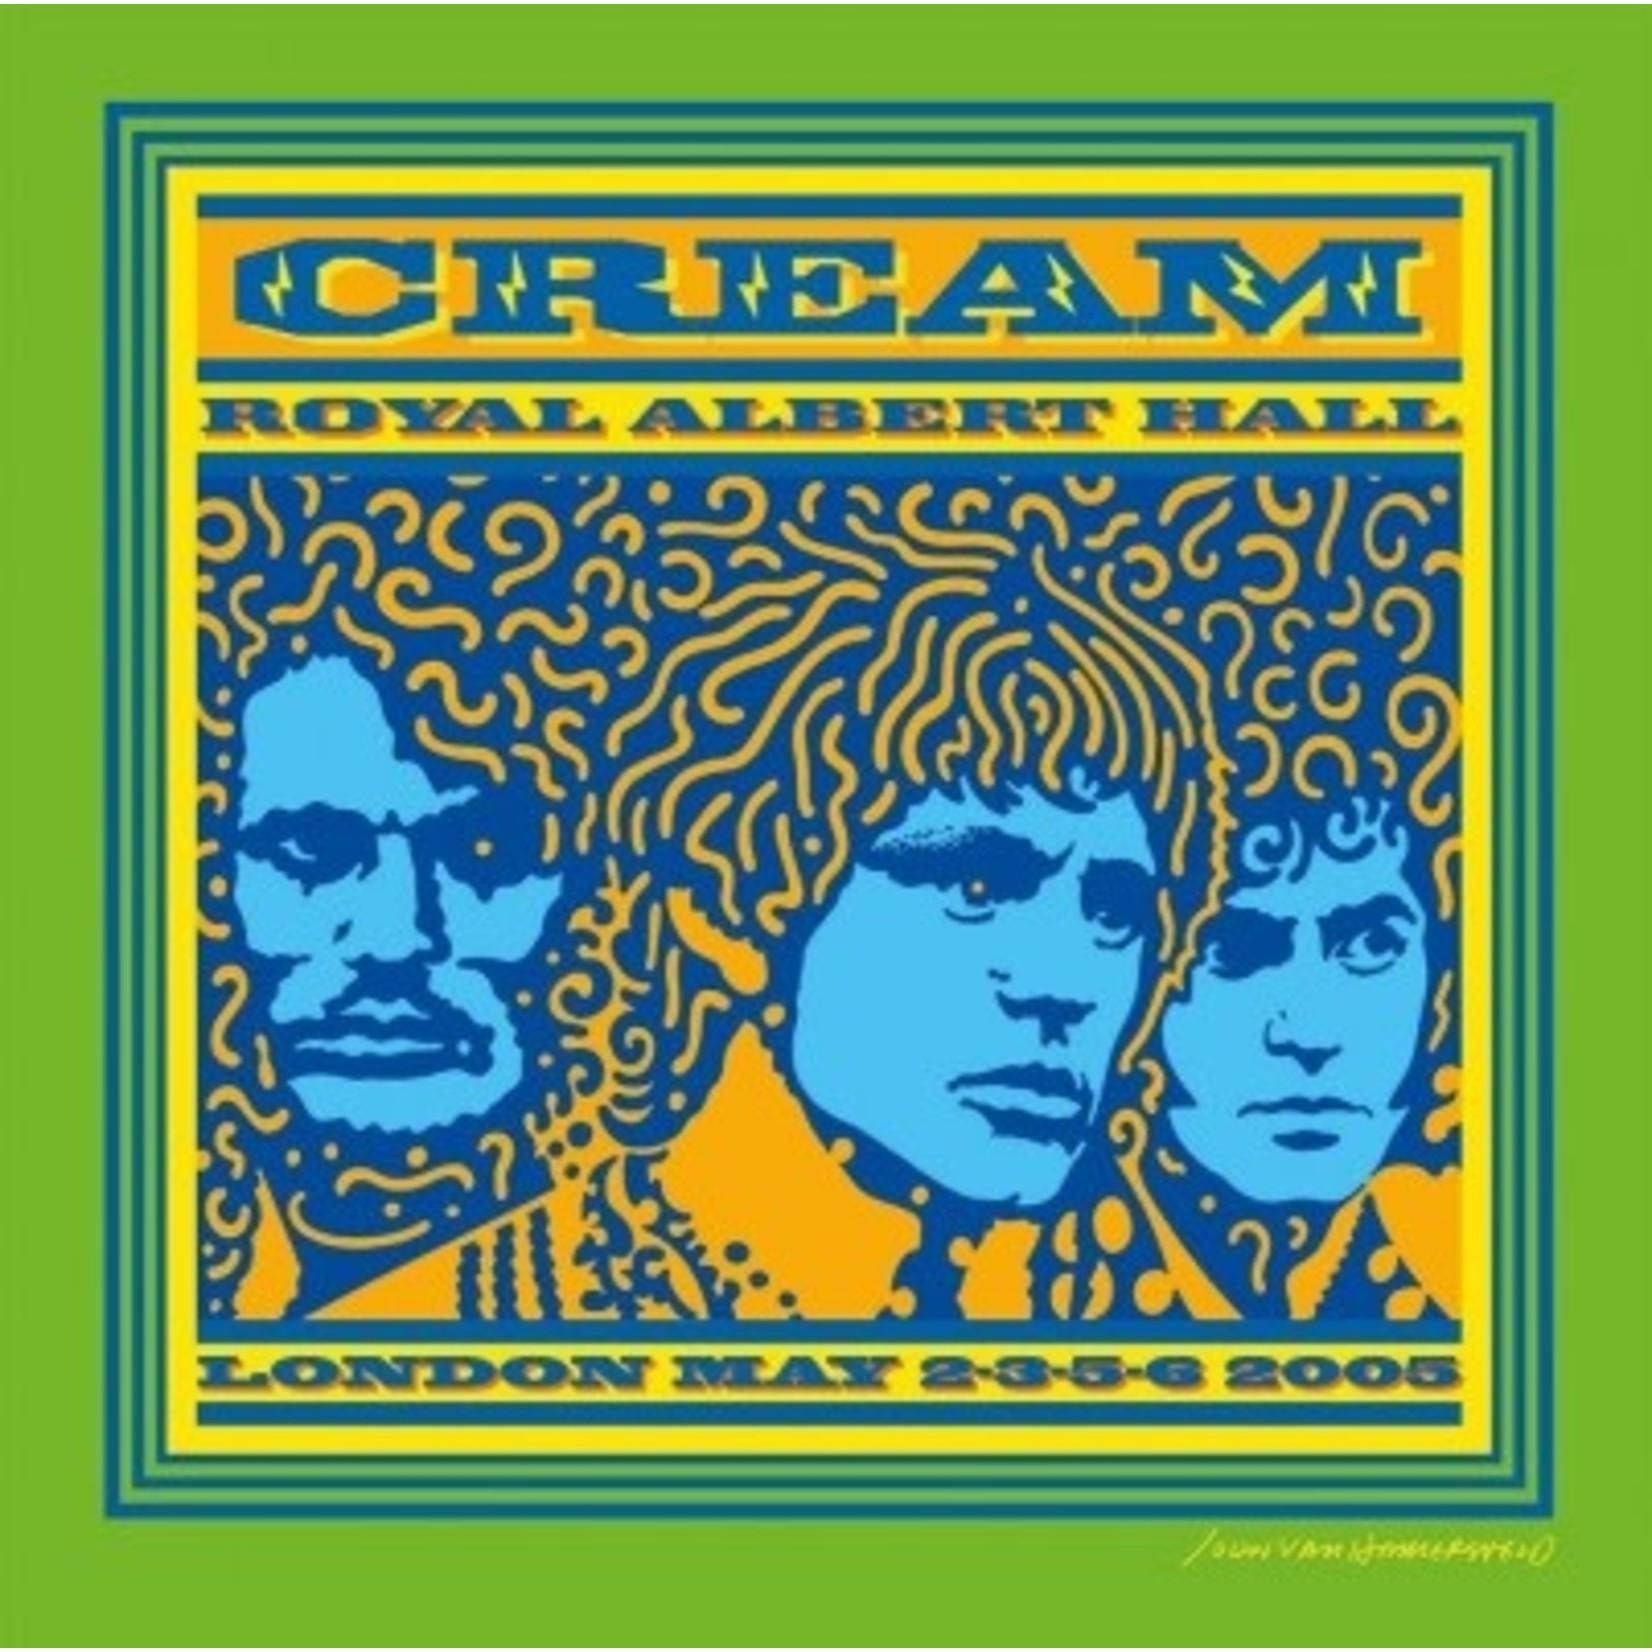 Vinyl Cream - Royal Albert Hall  2005 (3 LP)